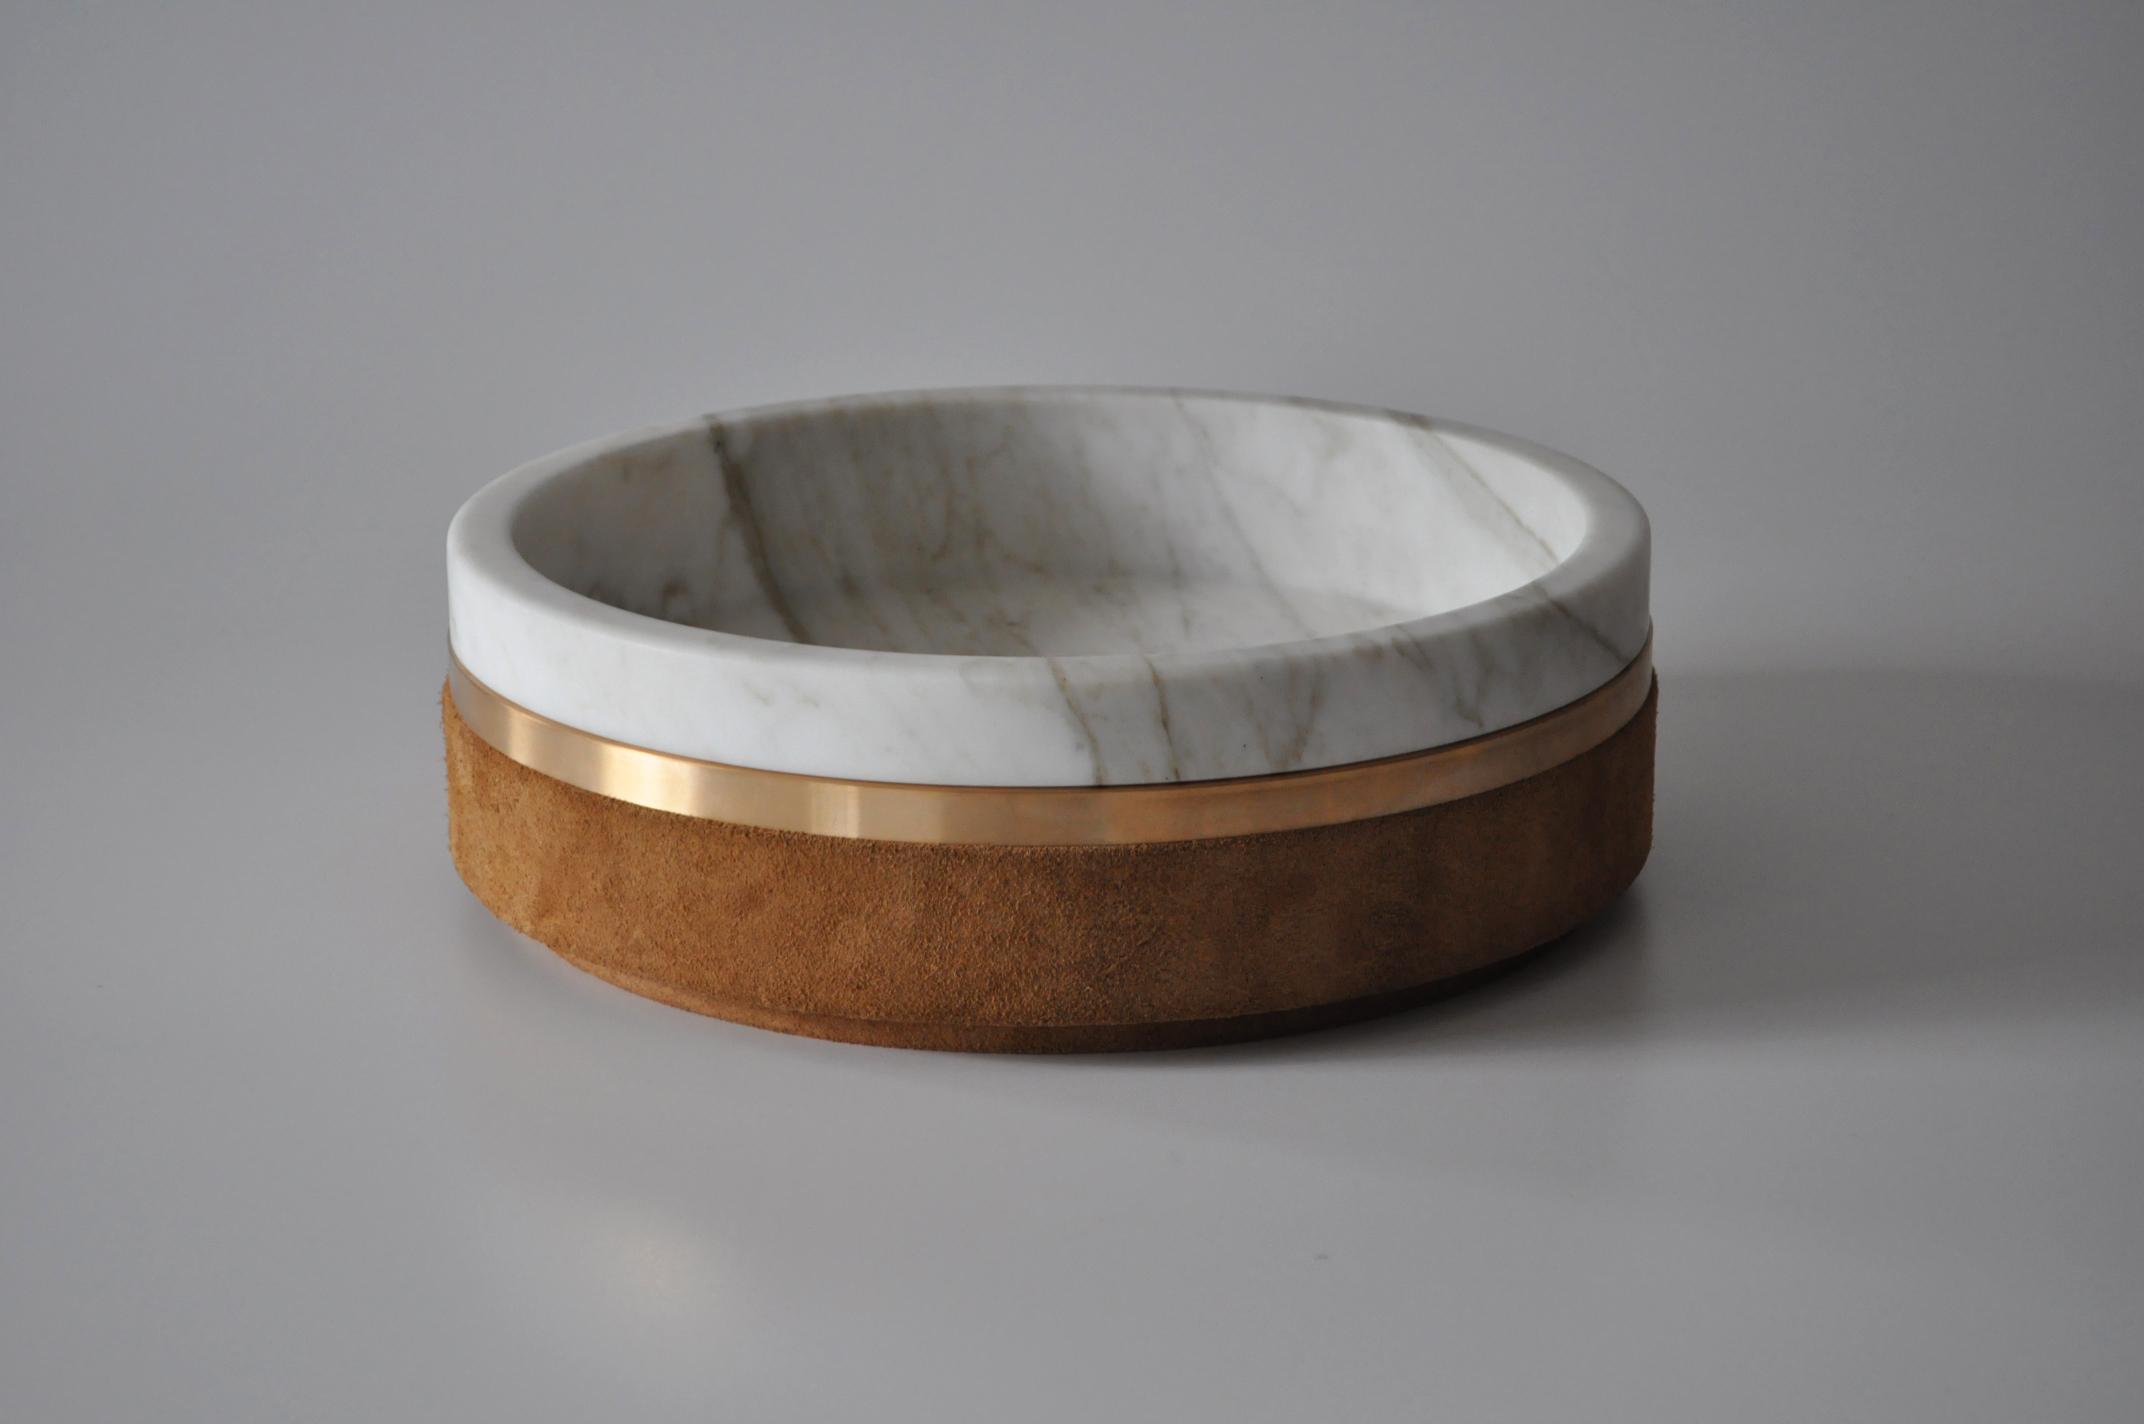 dure bowl calacatta & sand kopie